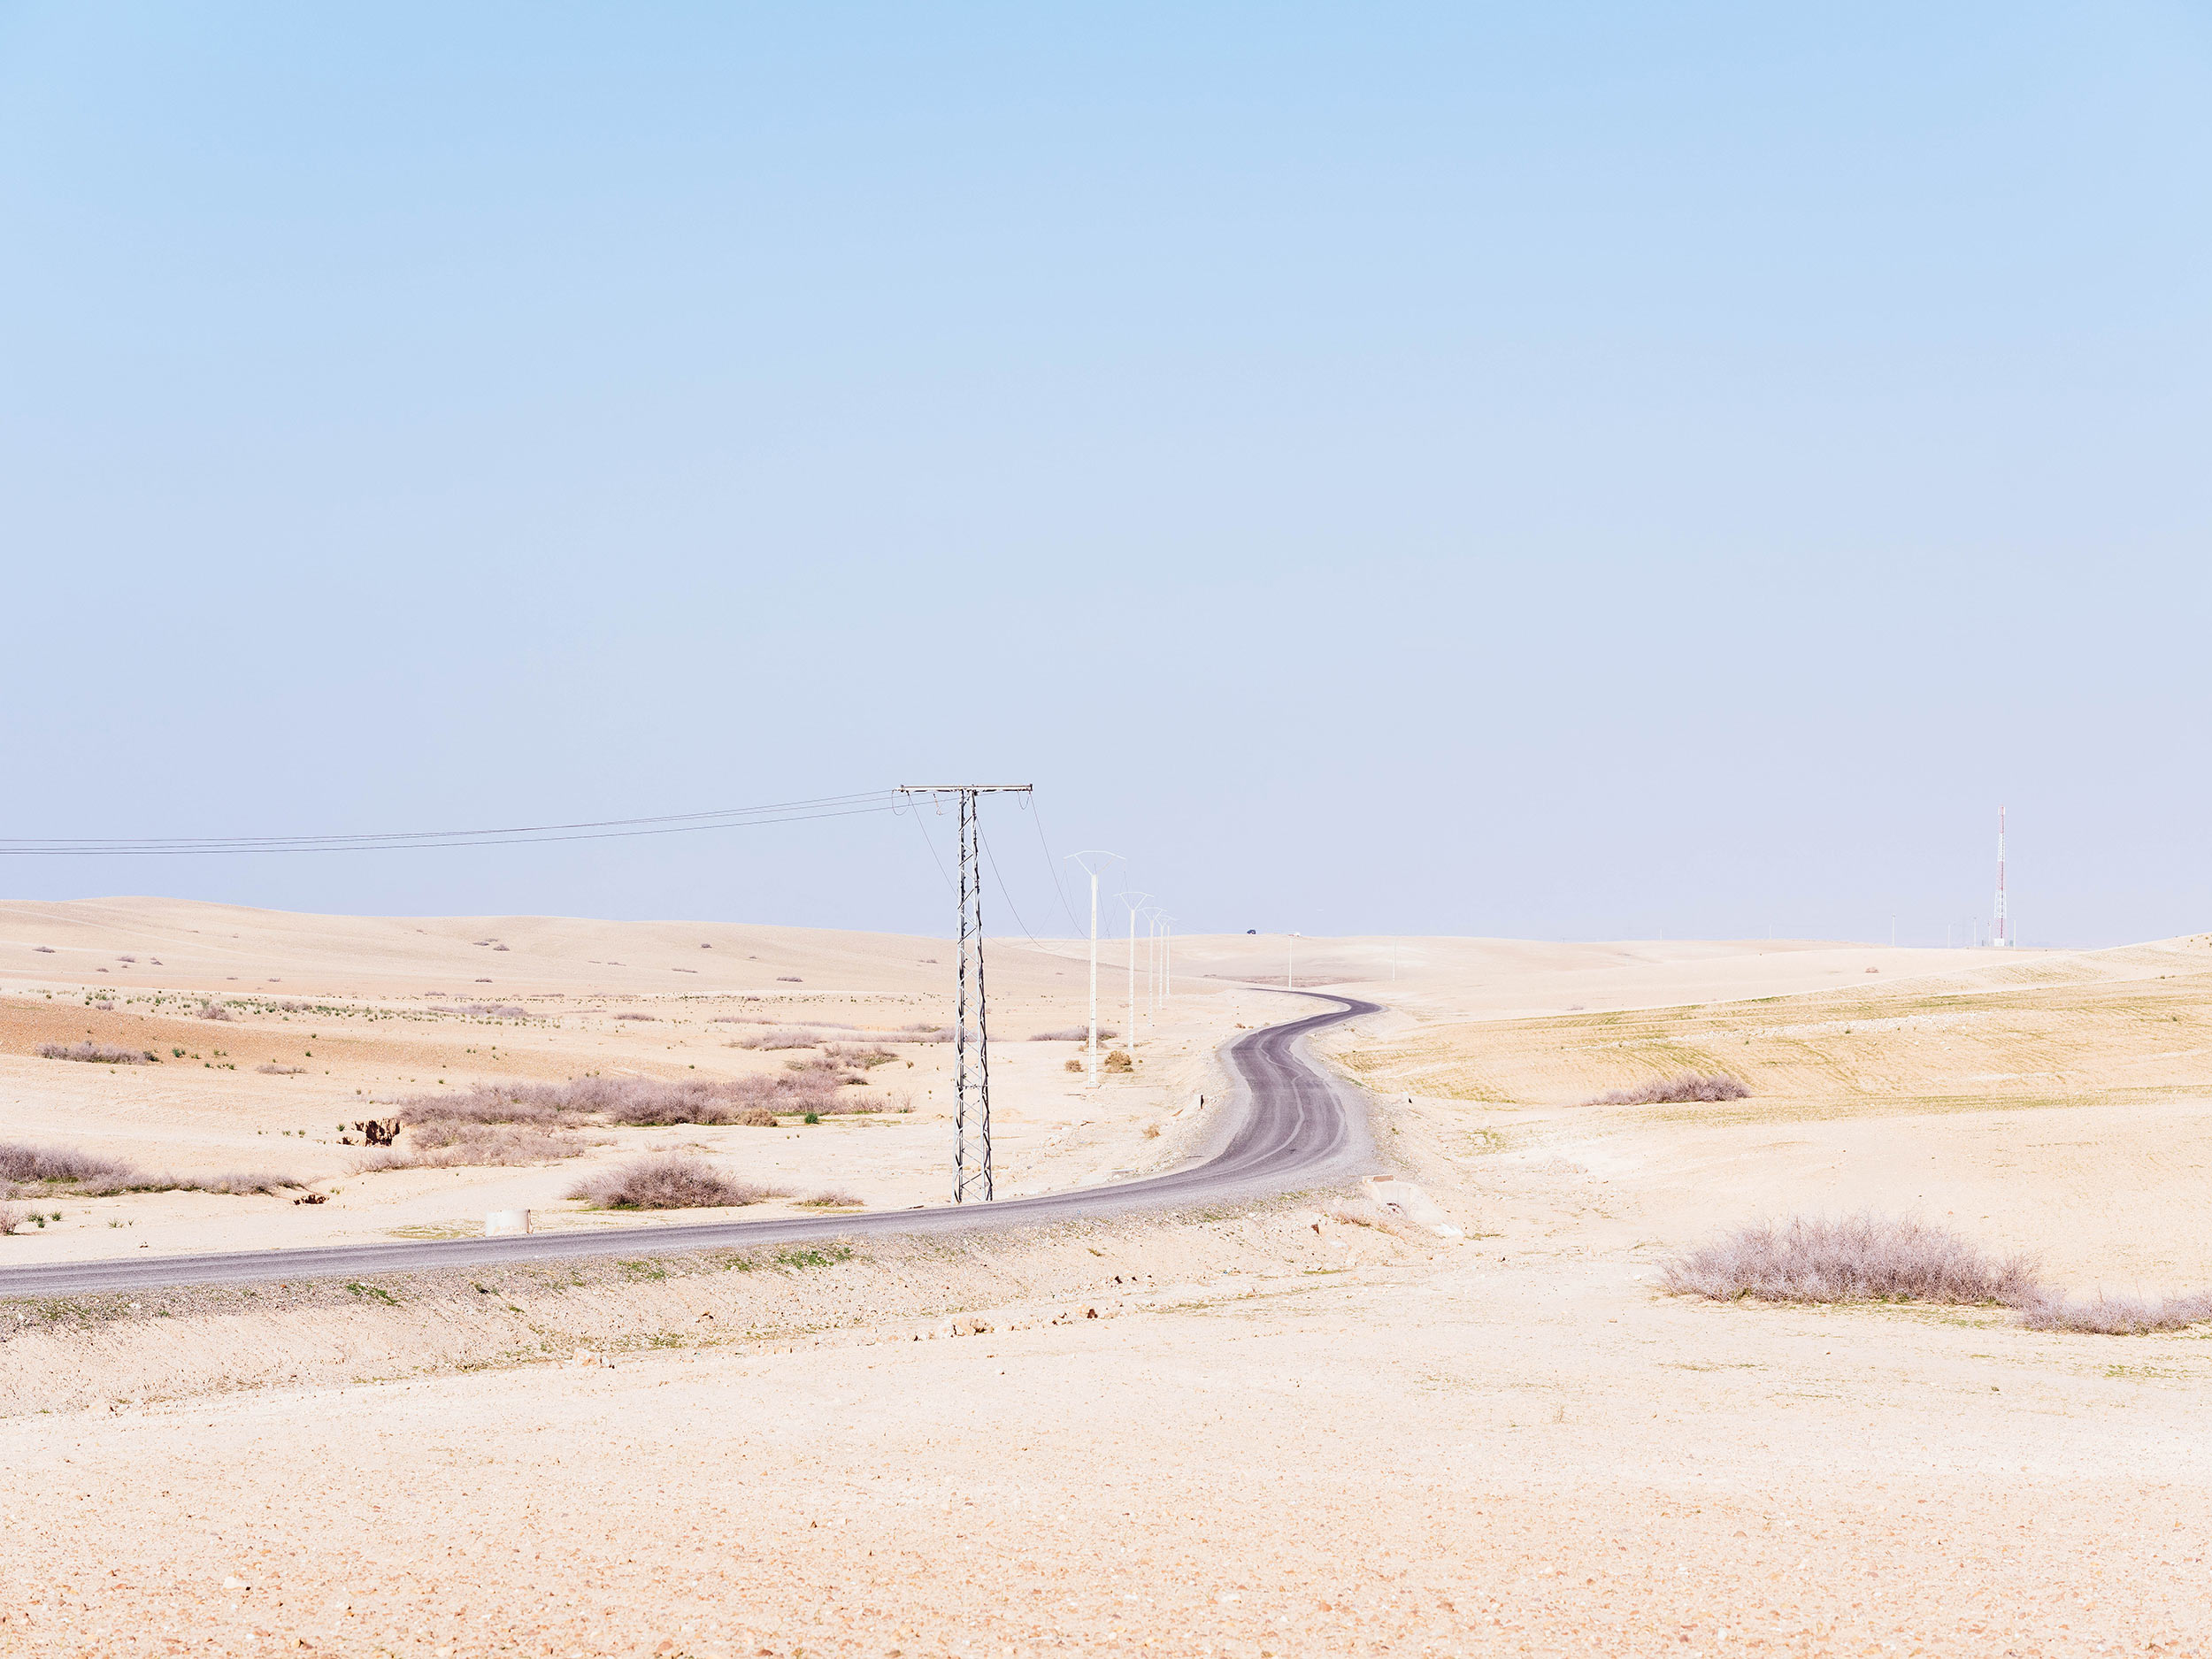 Morocco-08249.jpg